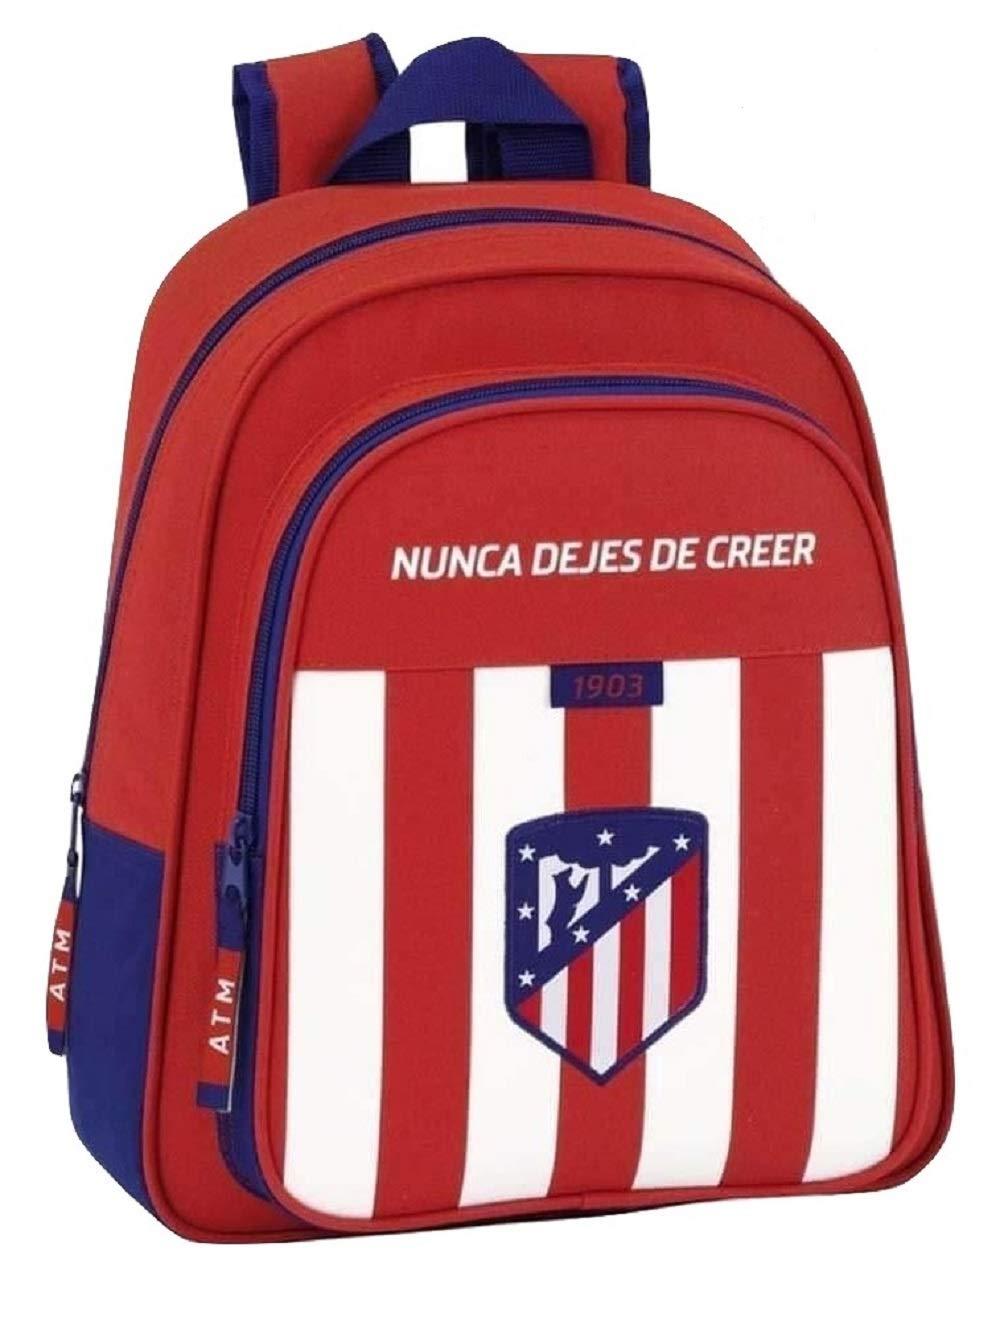 Safta Mochila Atlético De Madrid Oficial Mochila Infantil 280x100x340mm: Amazon.es: Equipaje